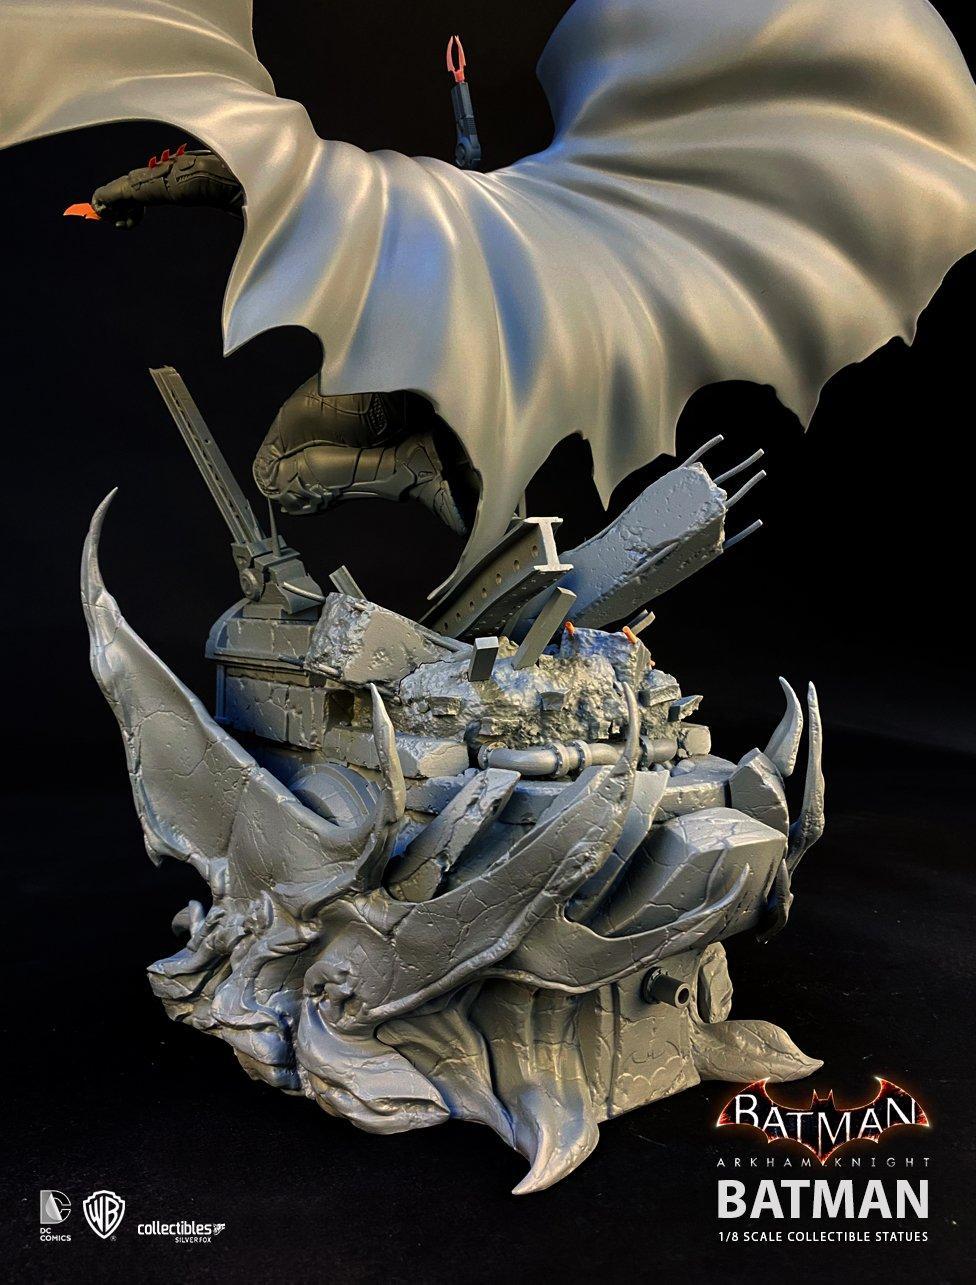 Batman siver fox collectibles batman arkham knight 1 8 scale statue8